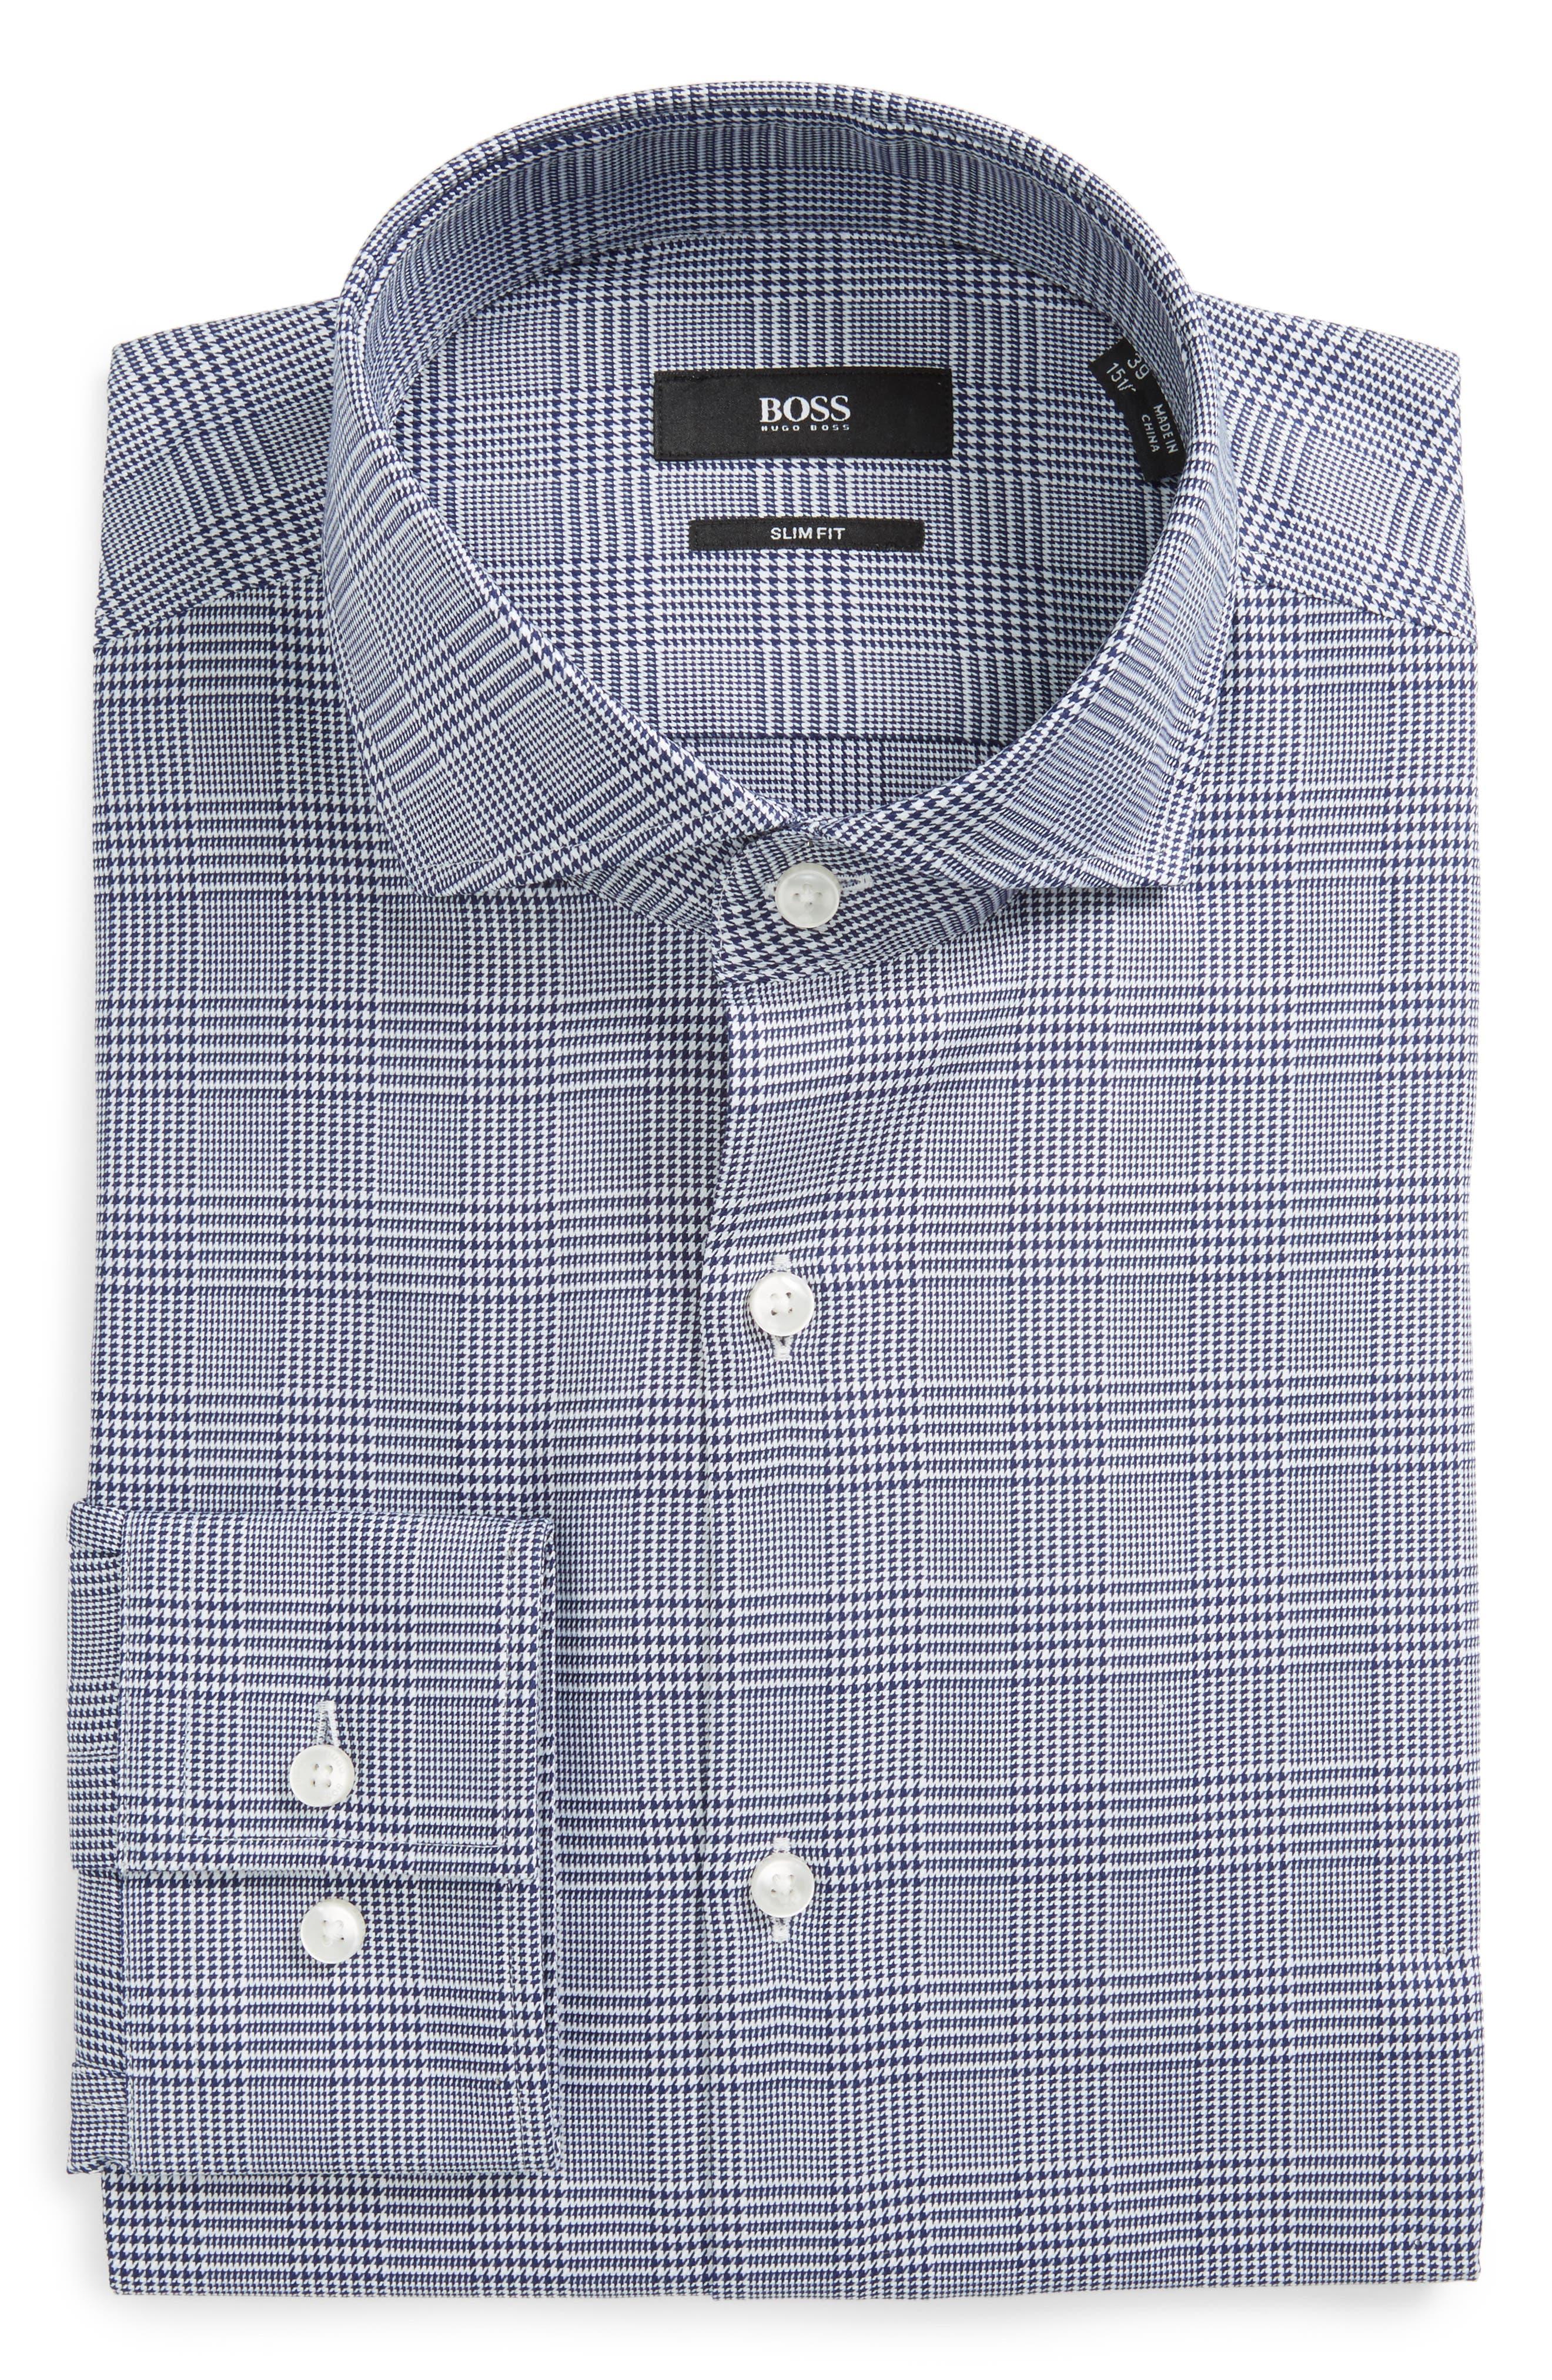 Alternate Image 1 Selected - BOSS Slim Fit Plaid Dress Shirt